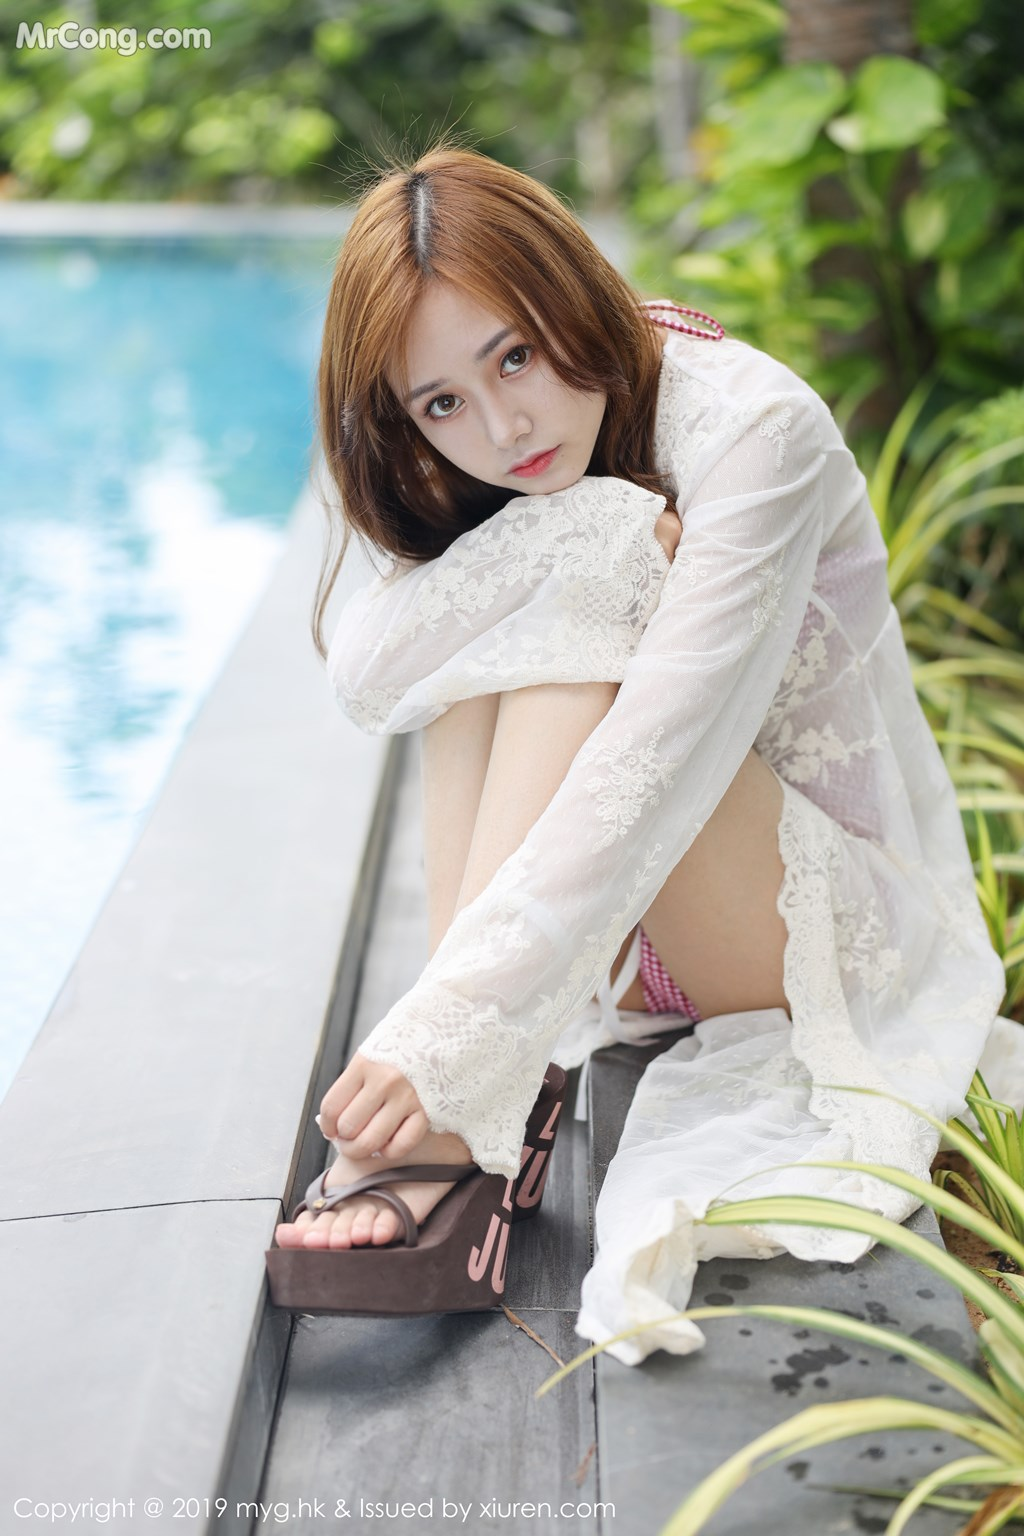 Image MyGirl-Vol.356-real-MrCong.com-001 in post MyGirl Vol.356: 羽住real (55 ảnh)